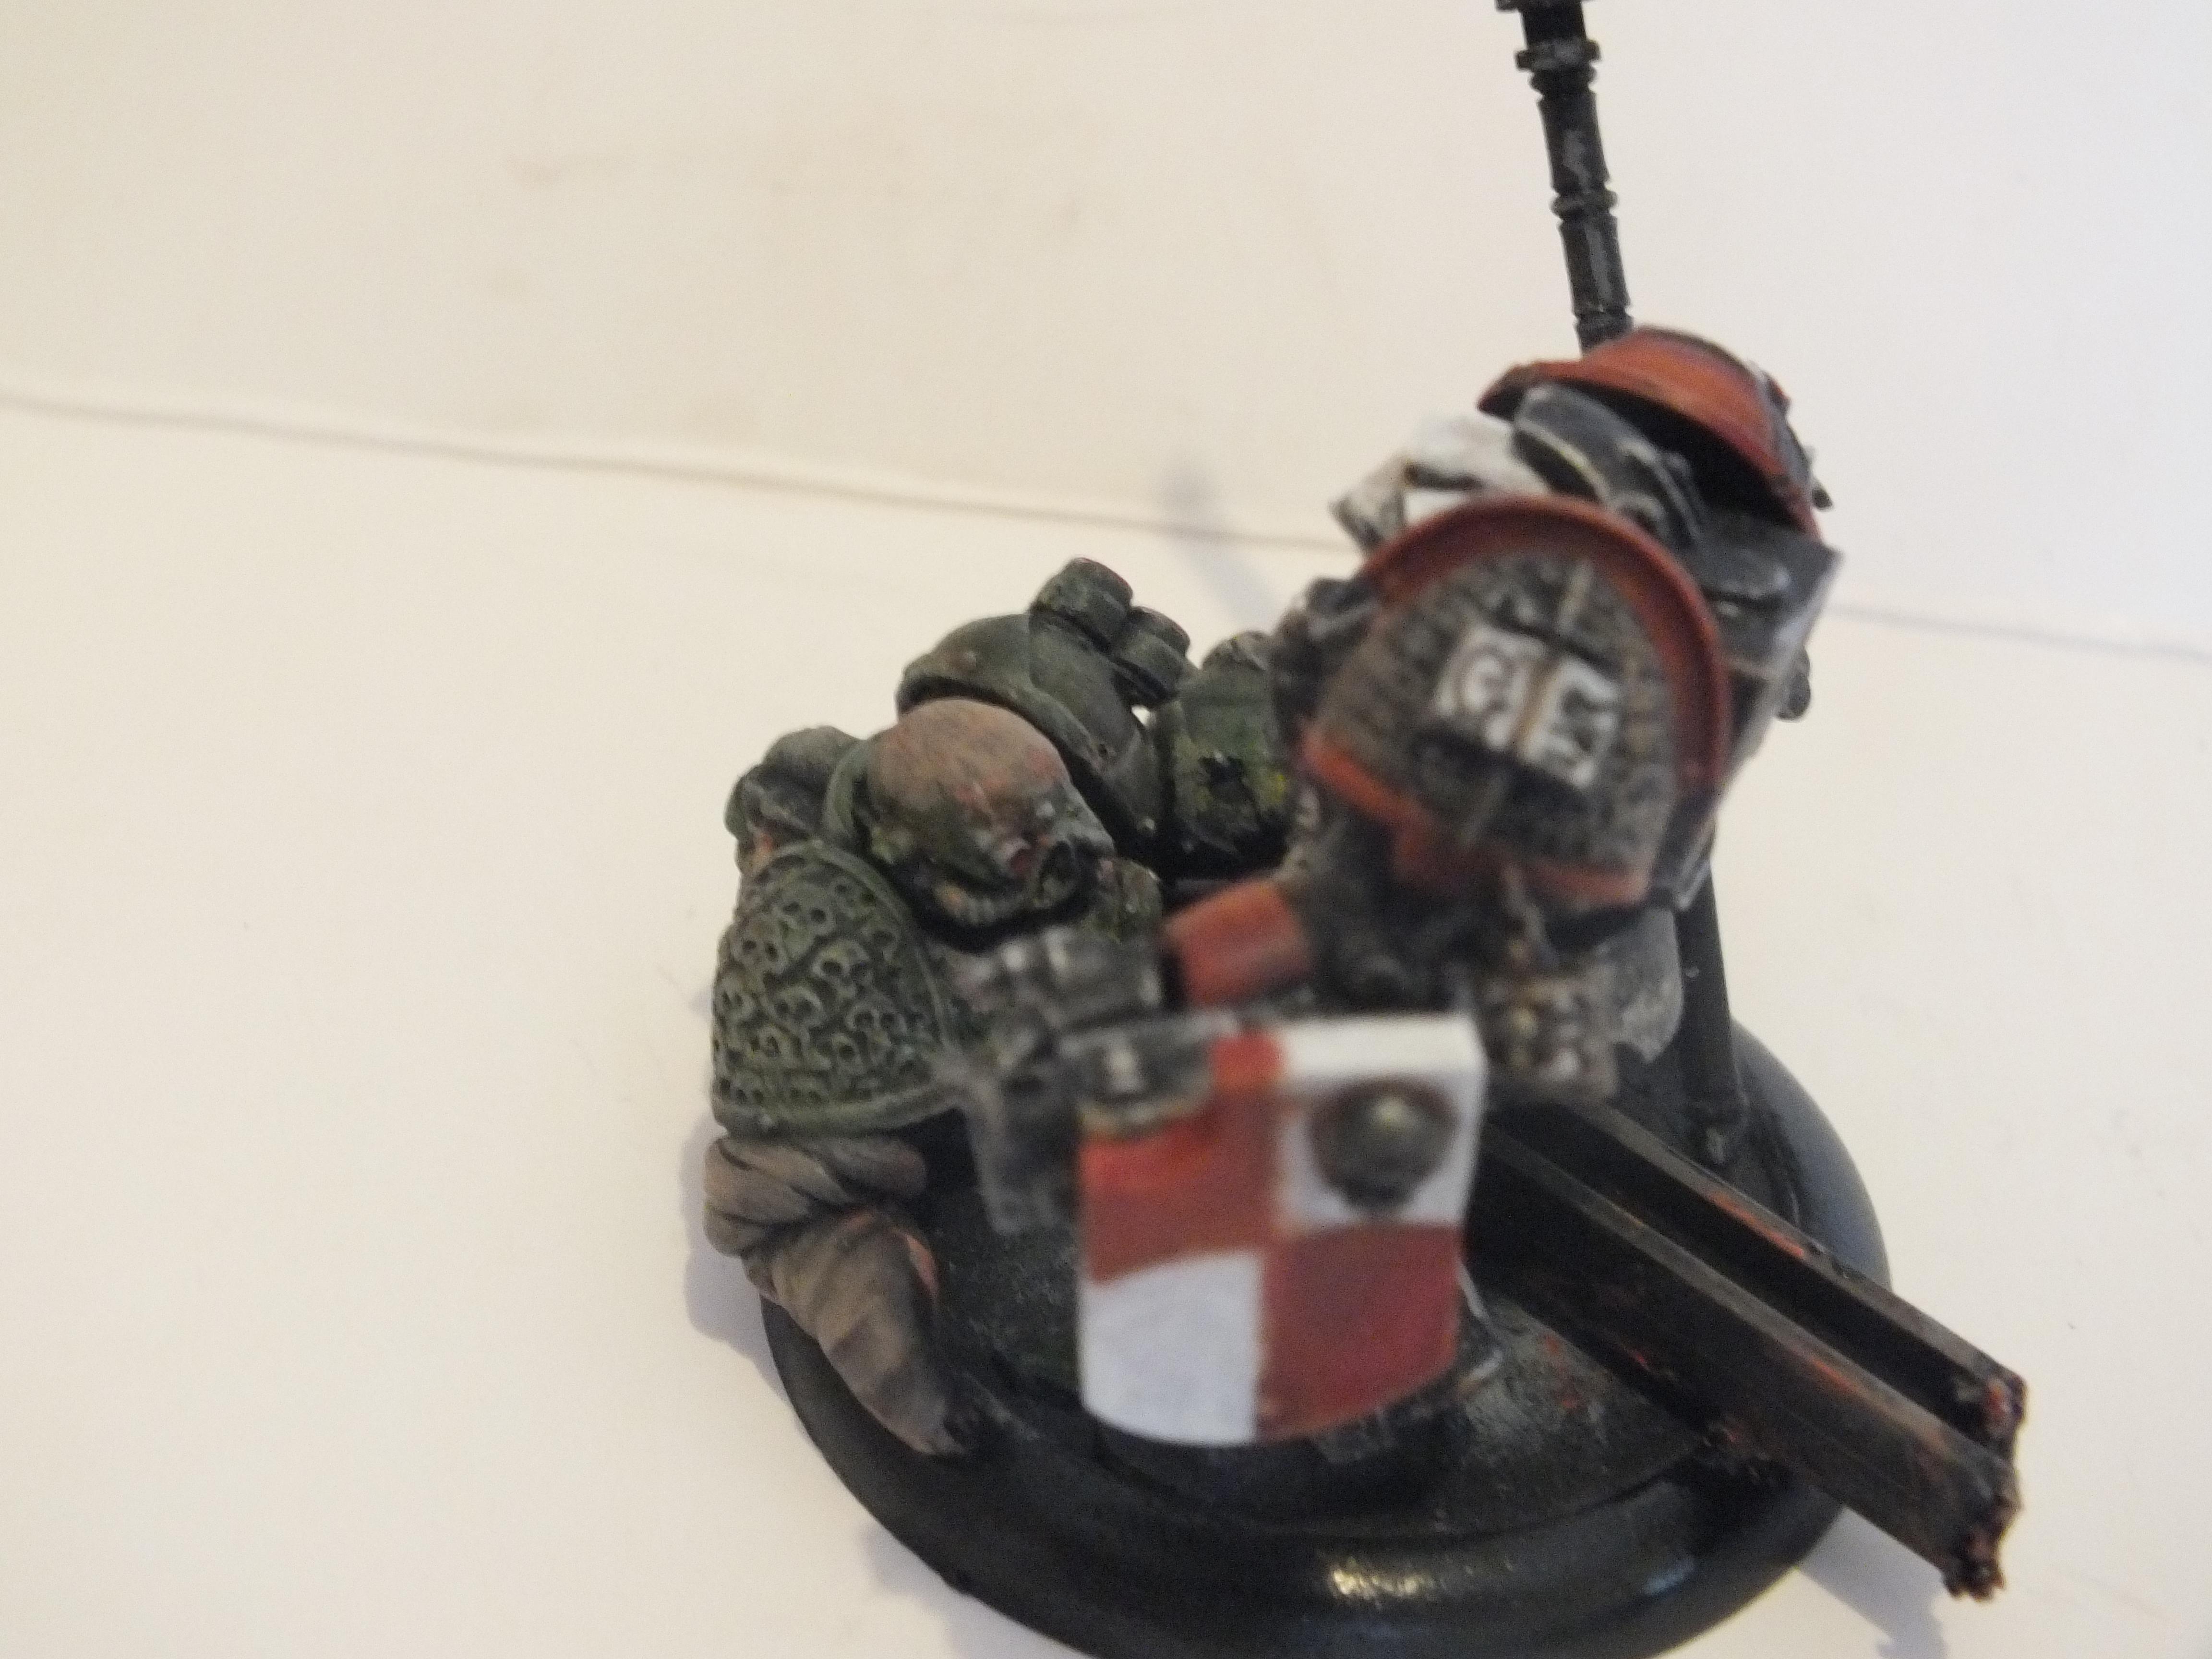 GK Paladin vs Death Guard detail